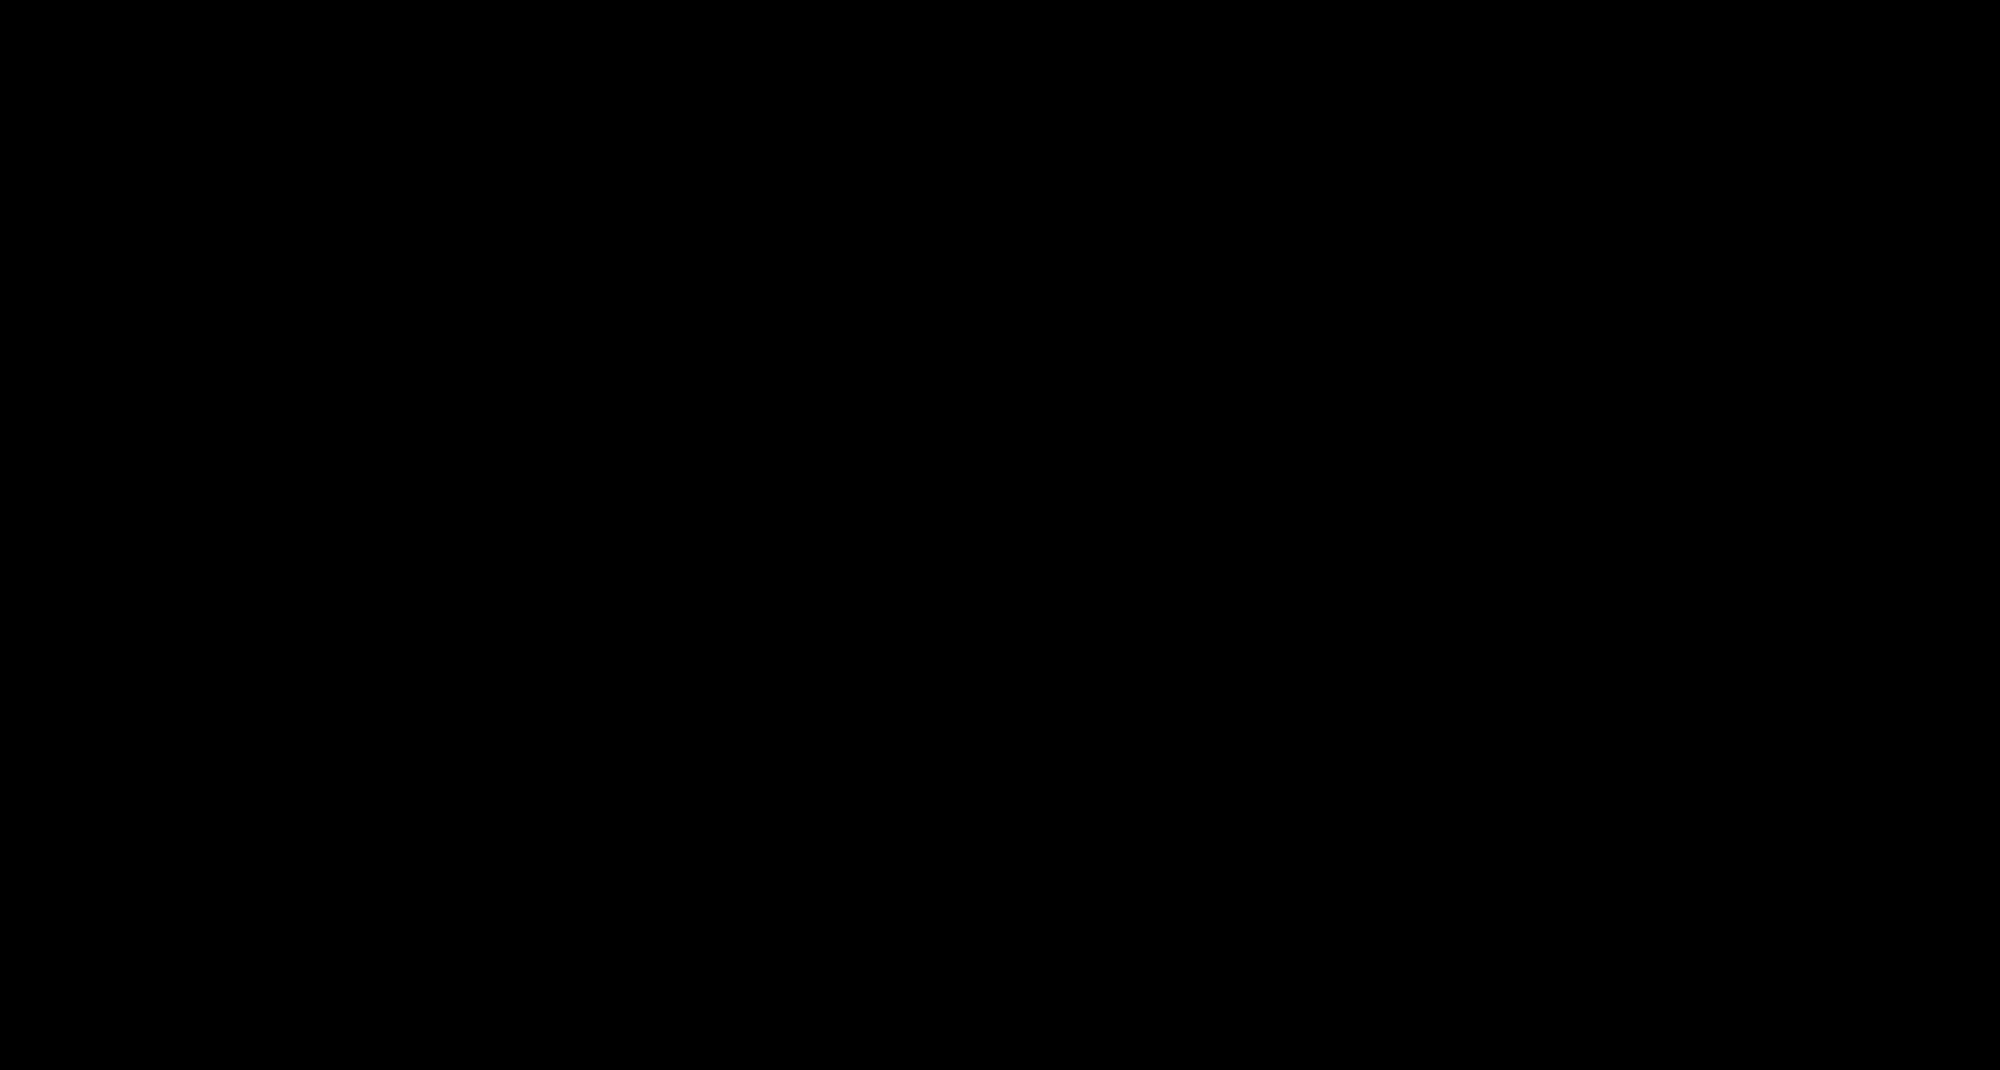 54768db041490 بوما - ويكيبيديا، الموسوعة الحرة